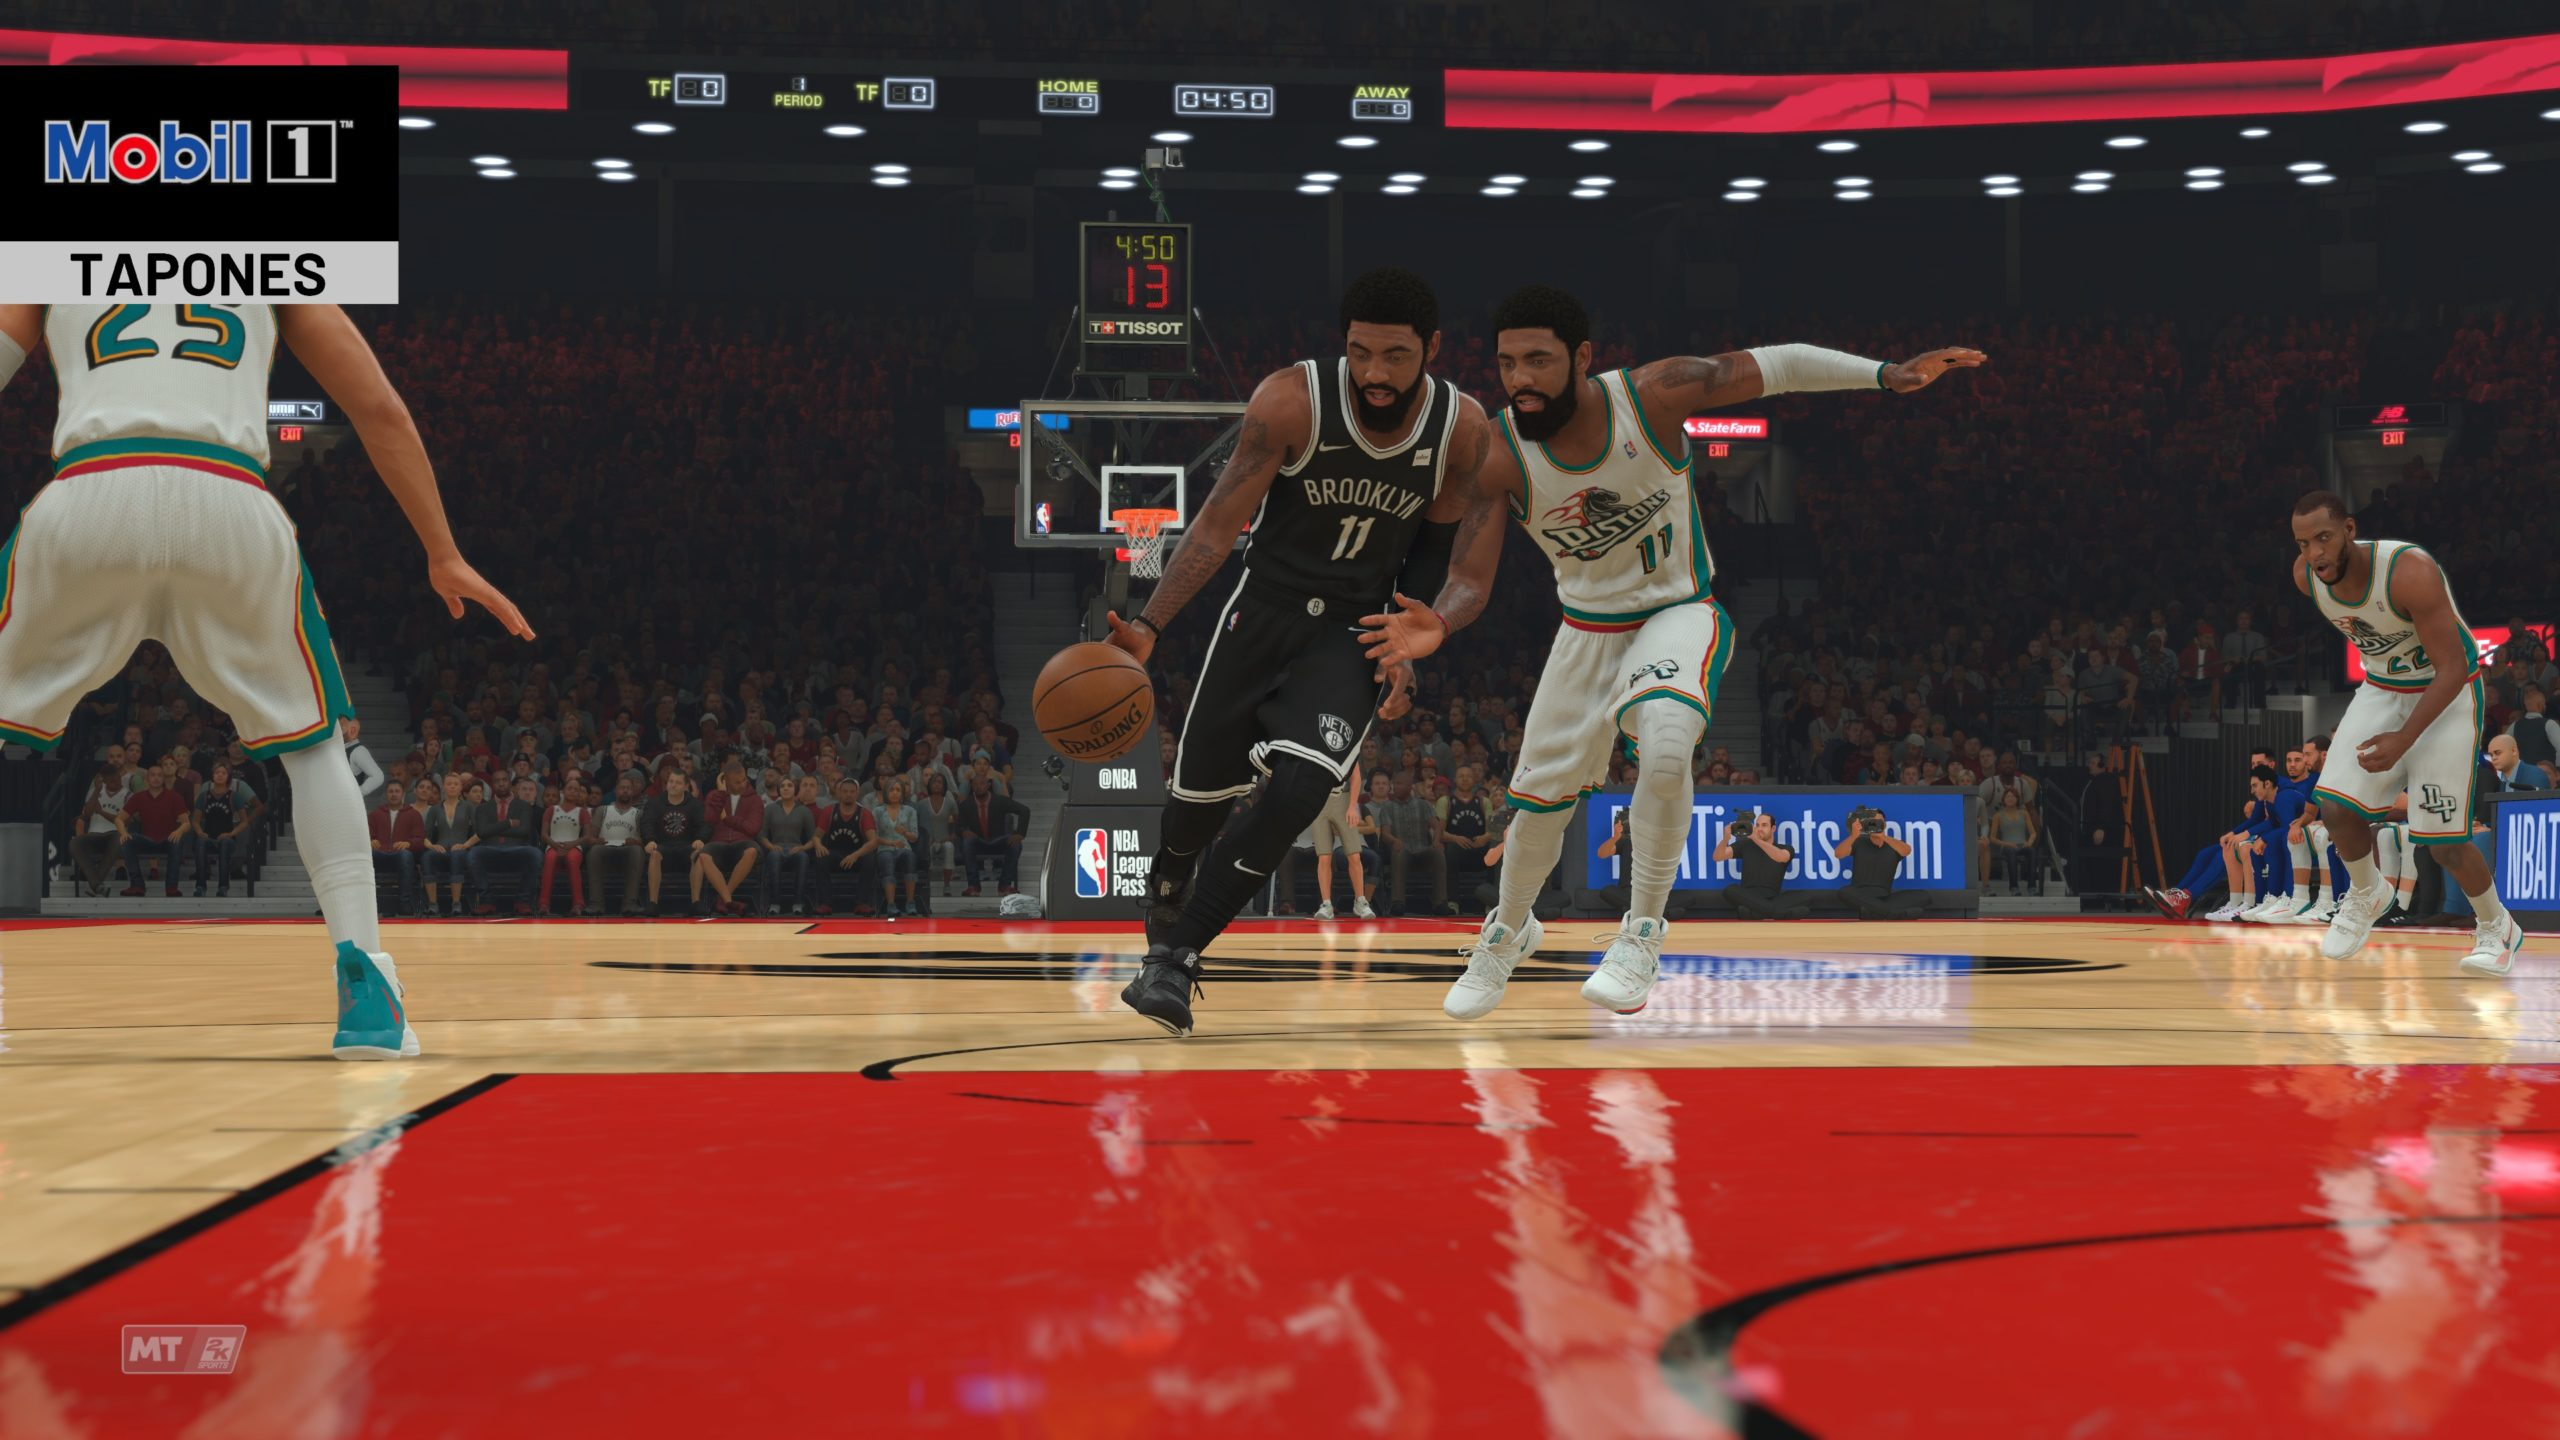 Nous analysons la NBA2K21 (Xbox One), grande salle de basket 30